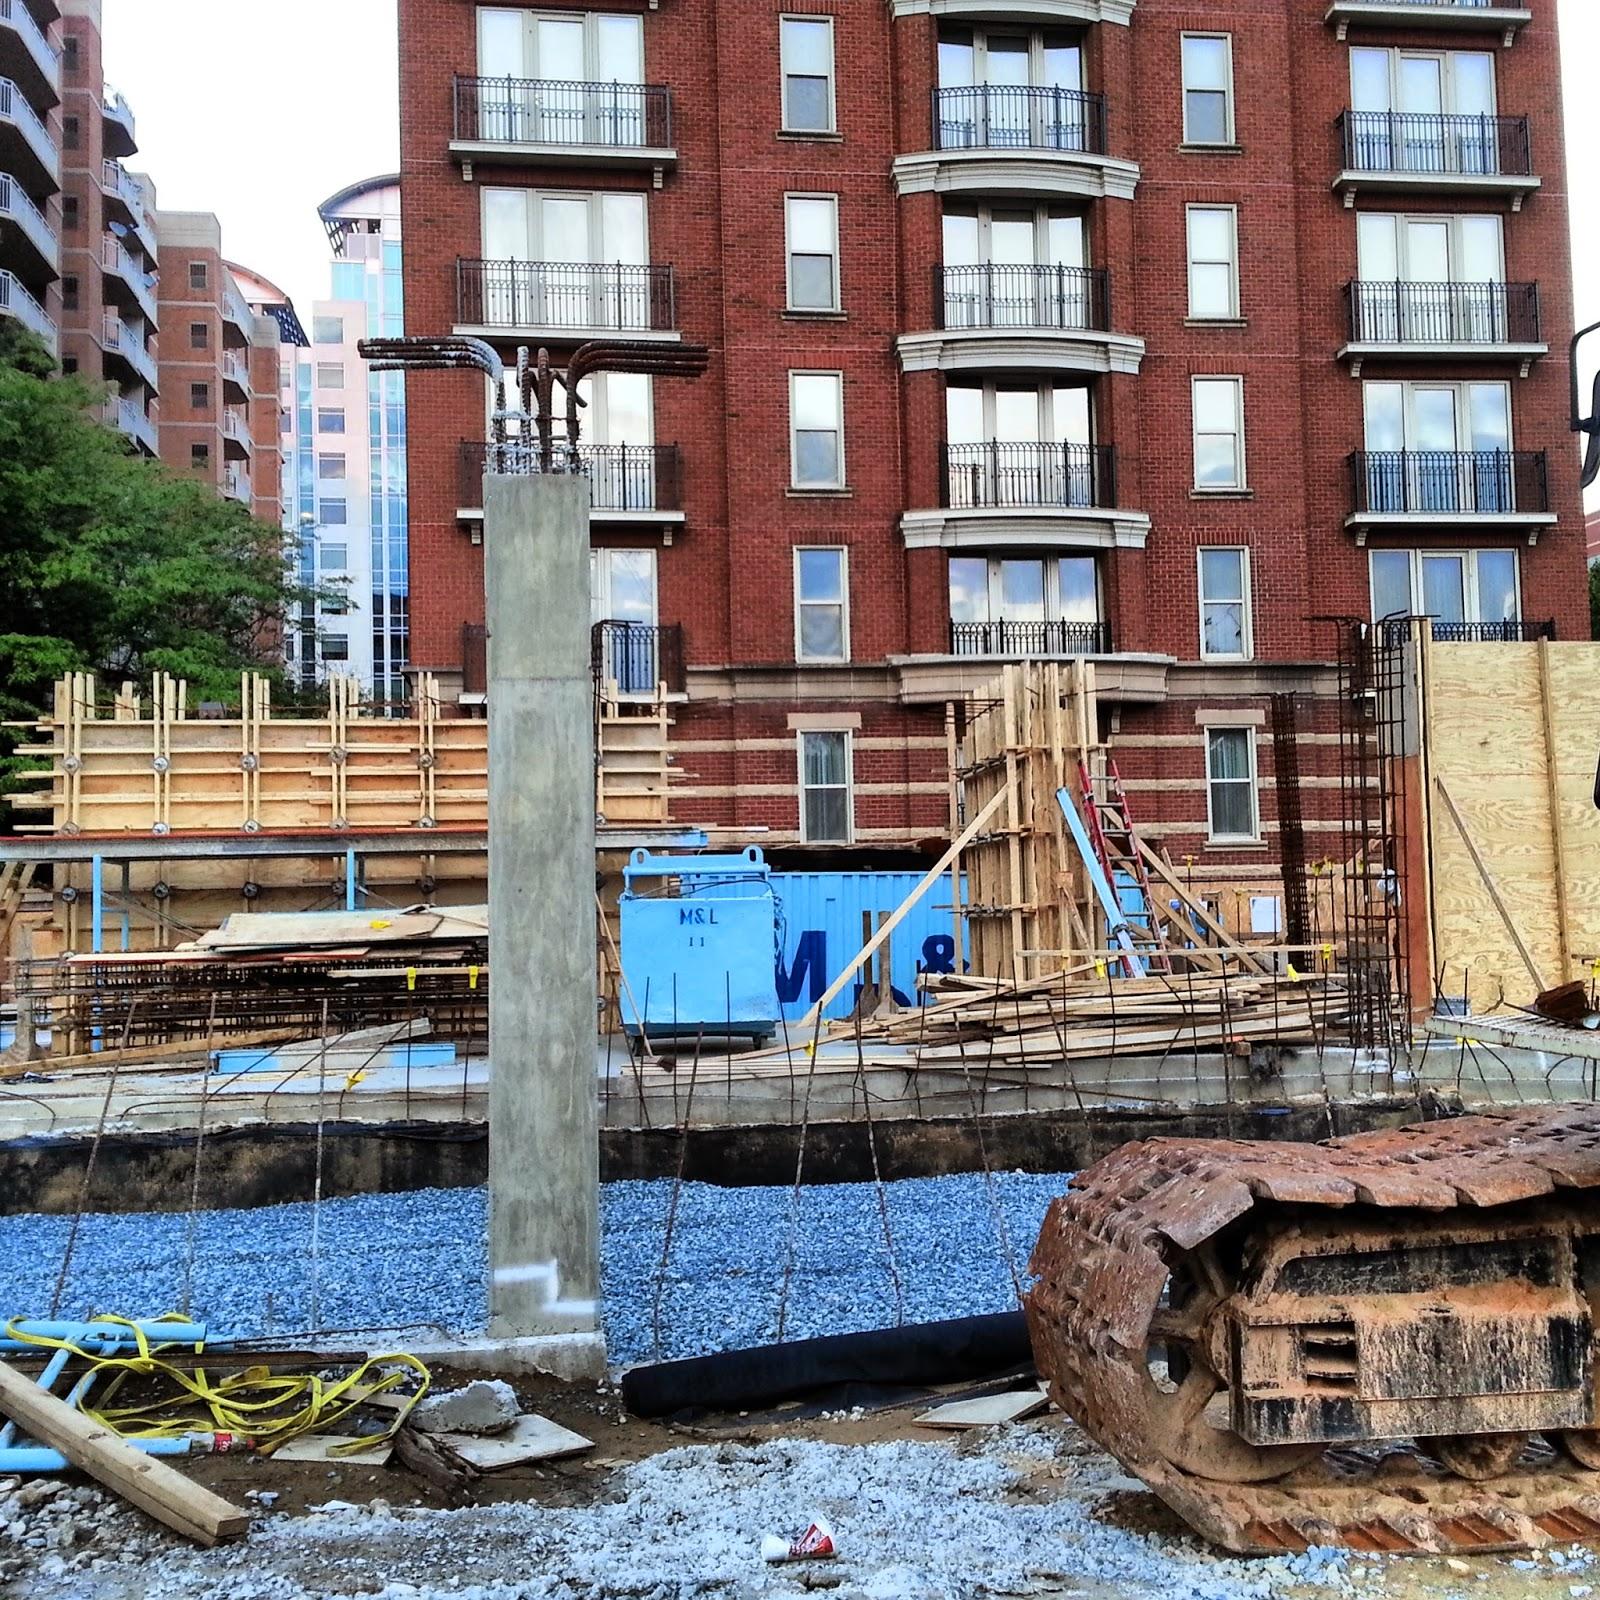 schenectady robert lane construction